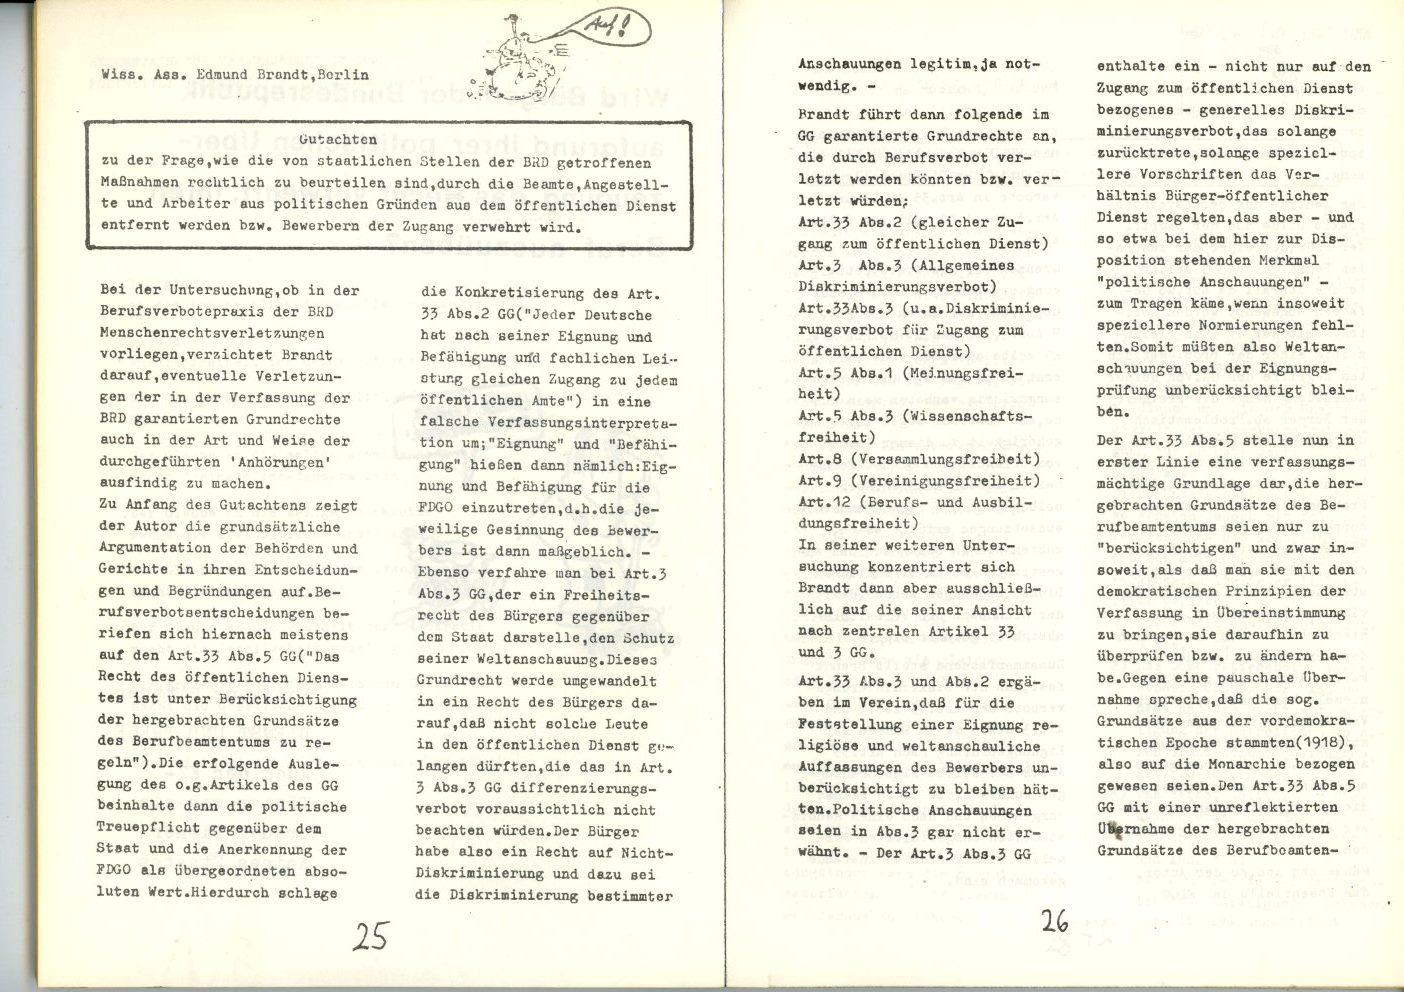 Marburg_Russell_Initiative_1978_14